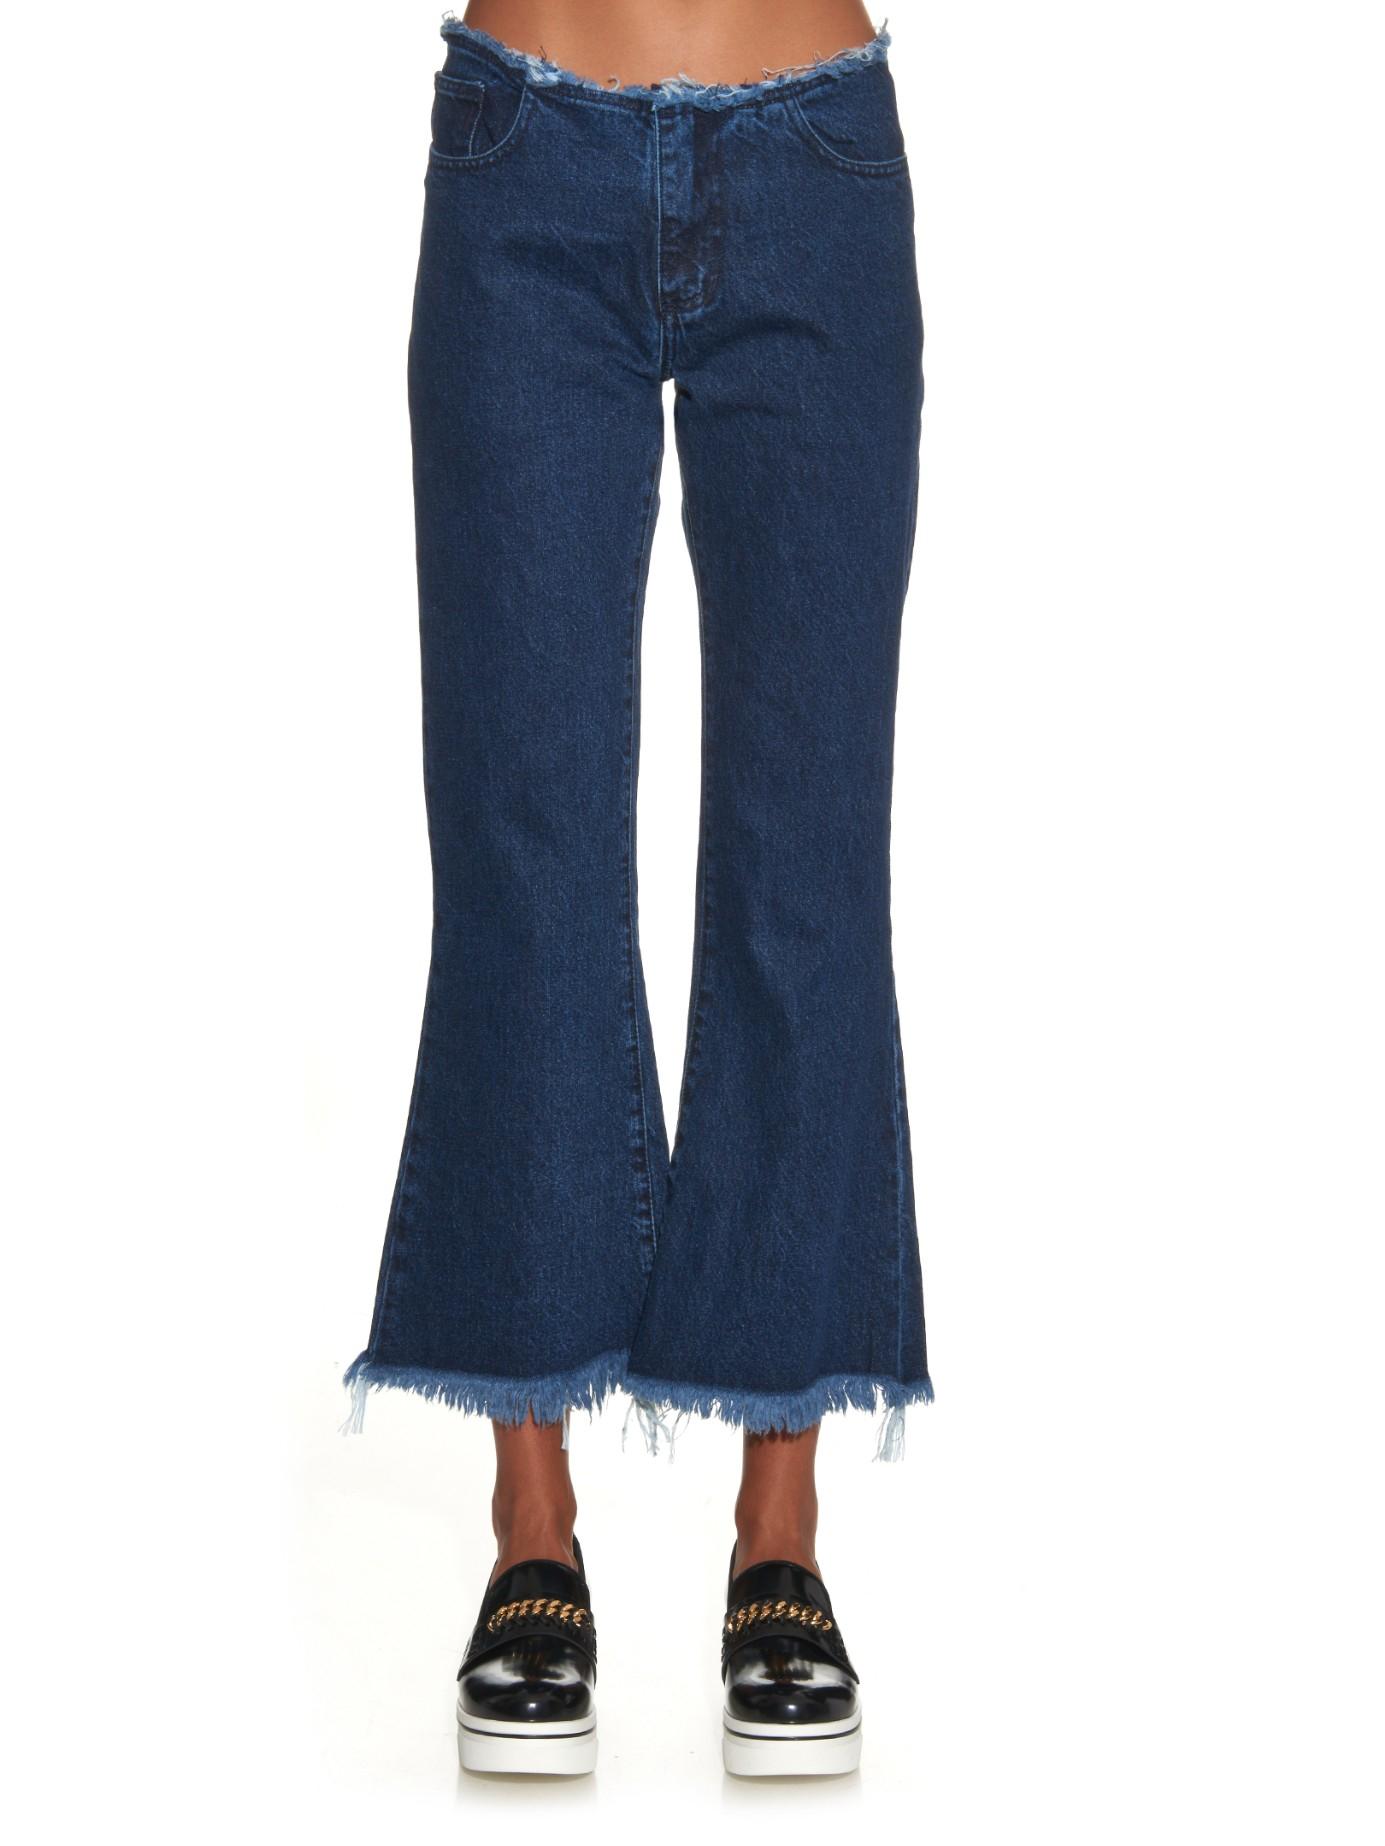 Marques'almeida Capri Frayed-edge Flared Jeans in Blue   Lyst